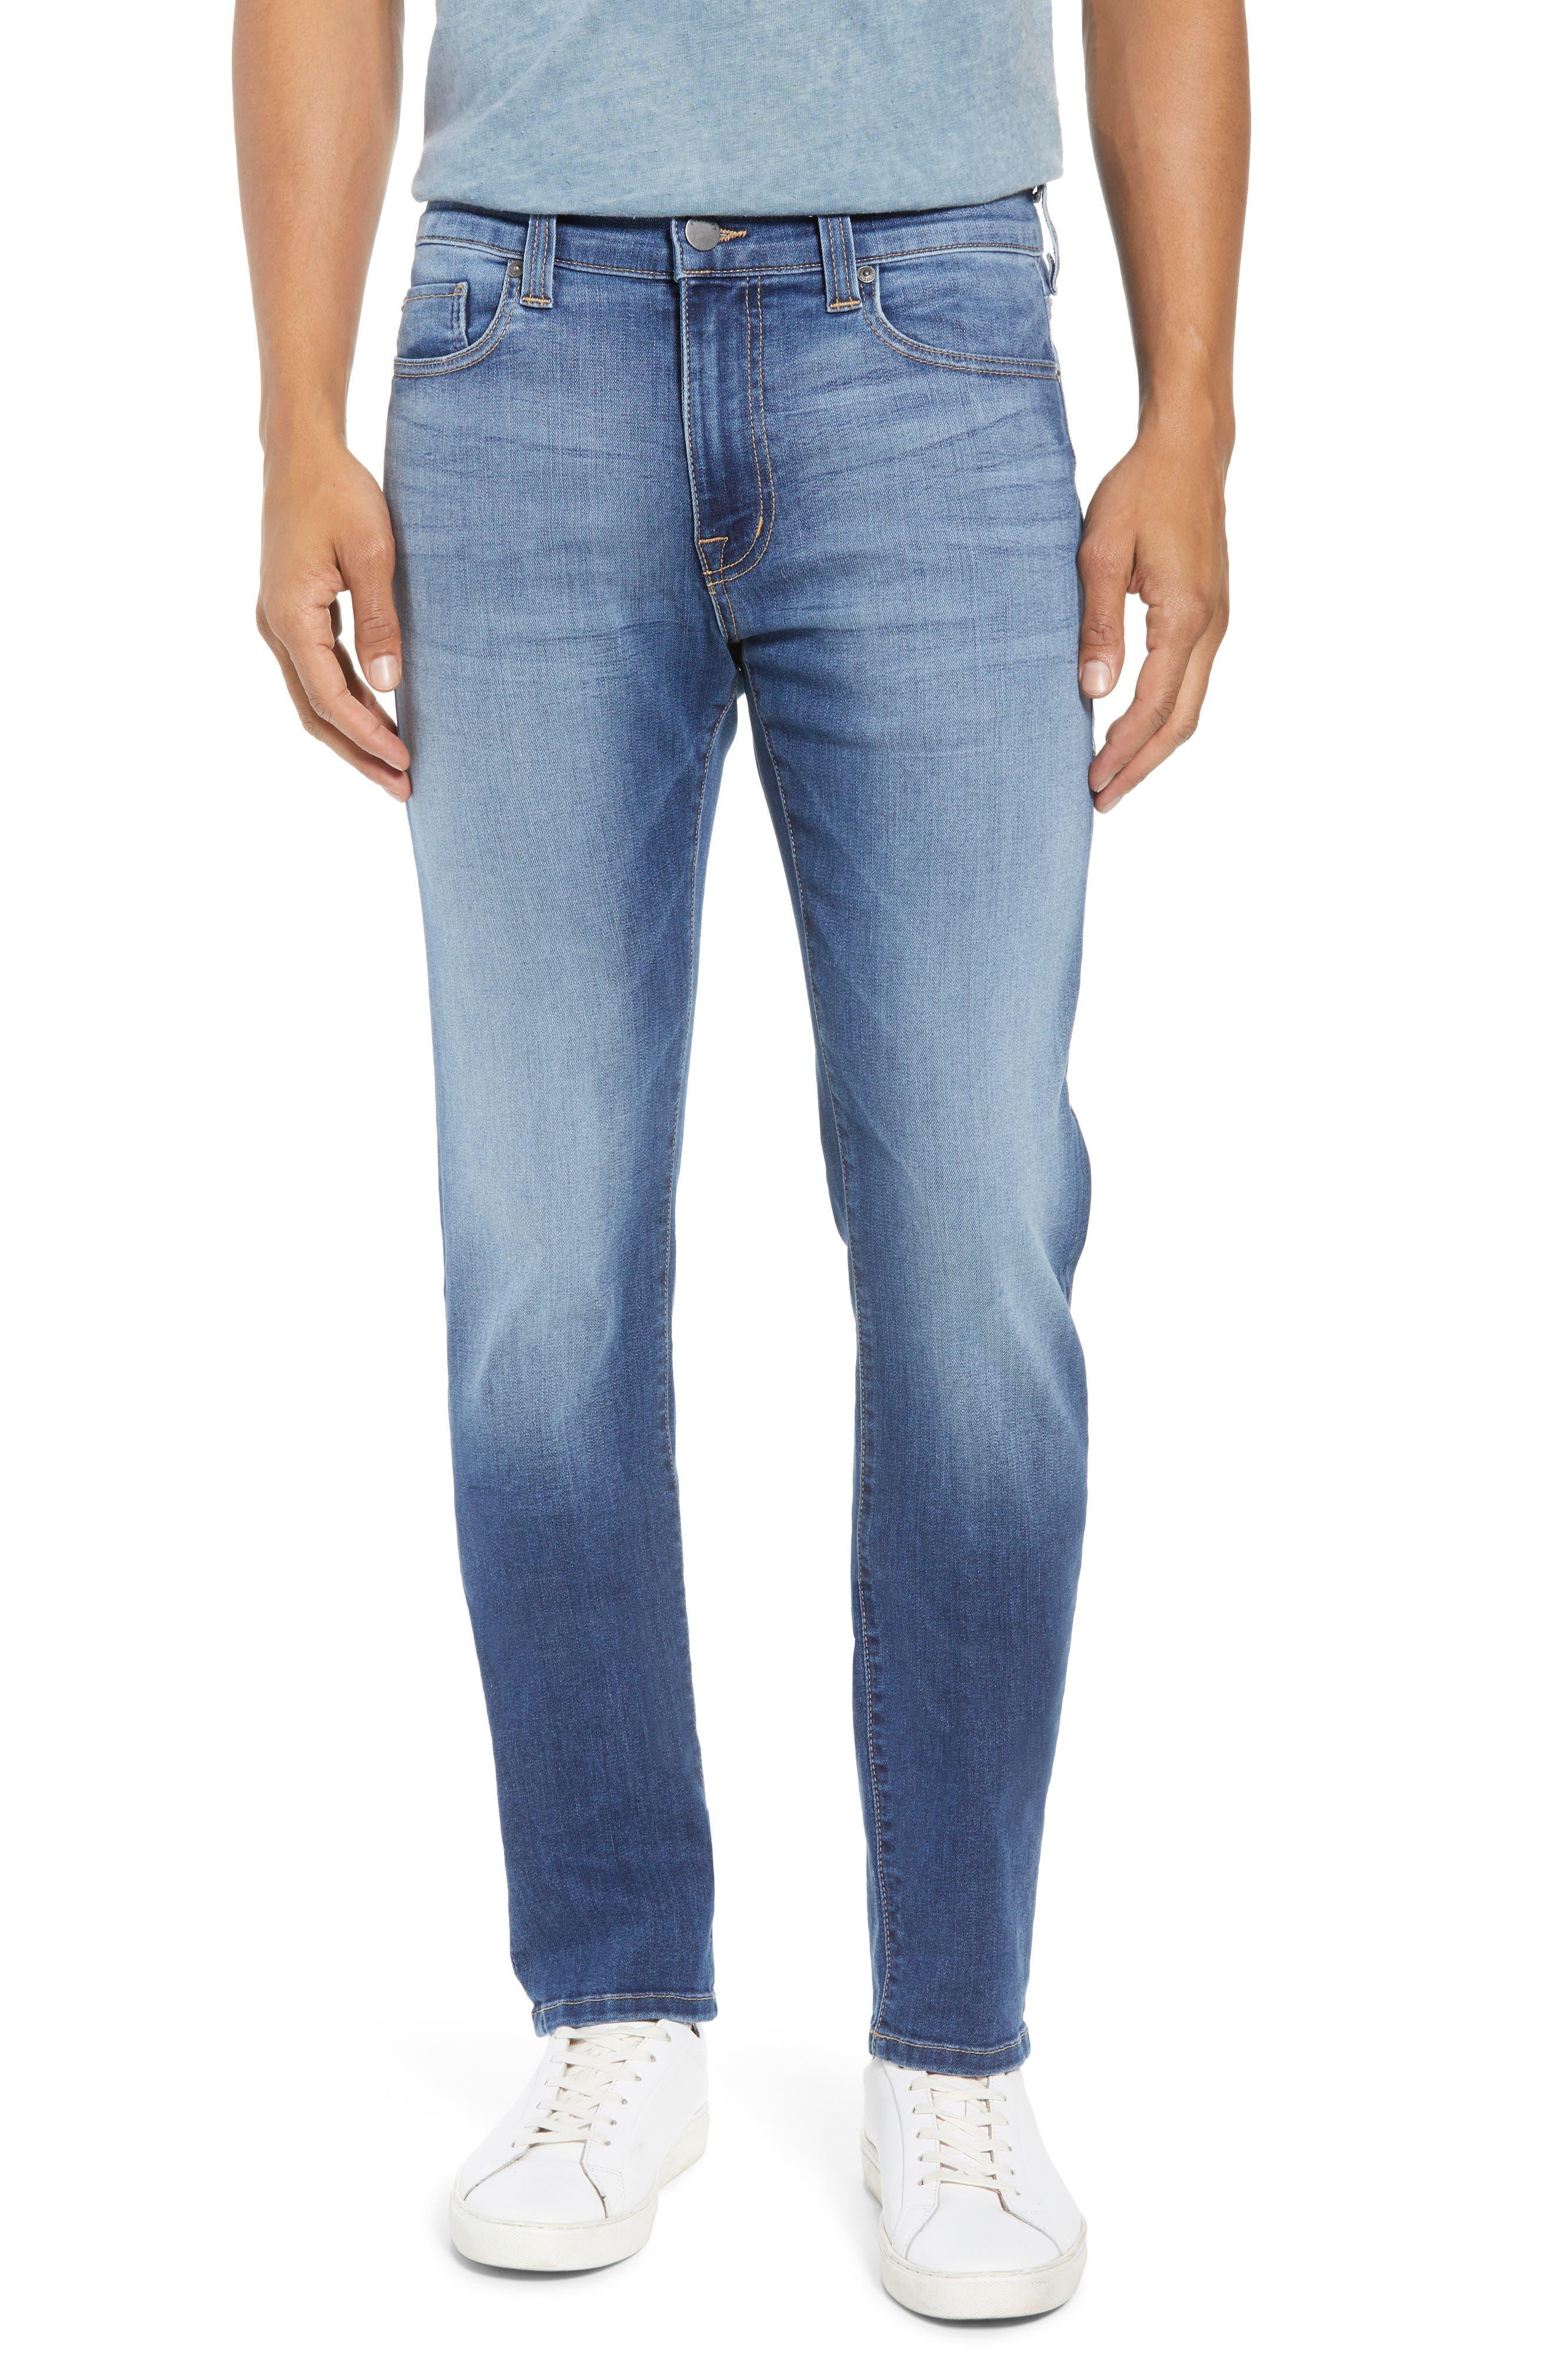 Torino Slim Fit Jeans,                         Main,                         color,